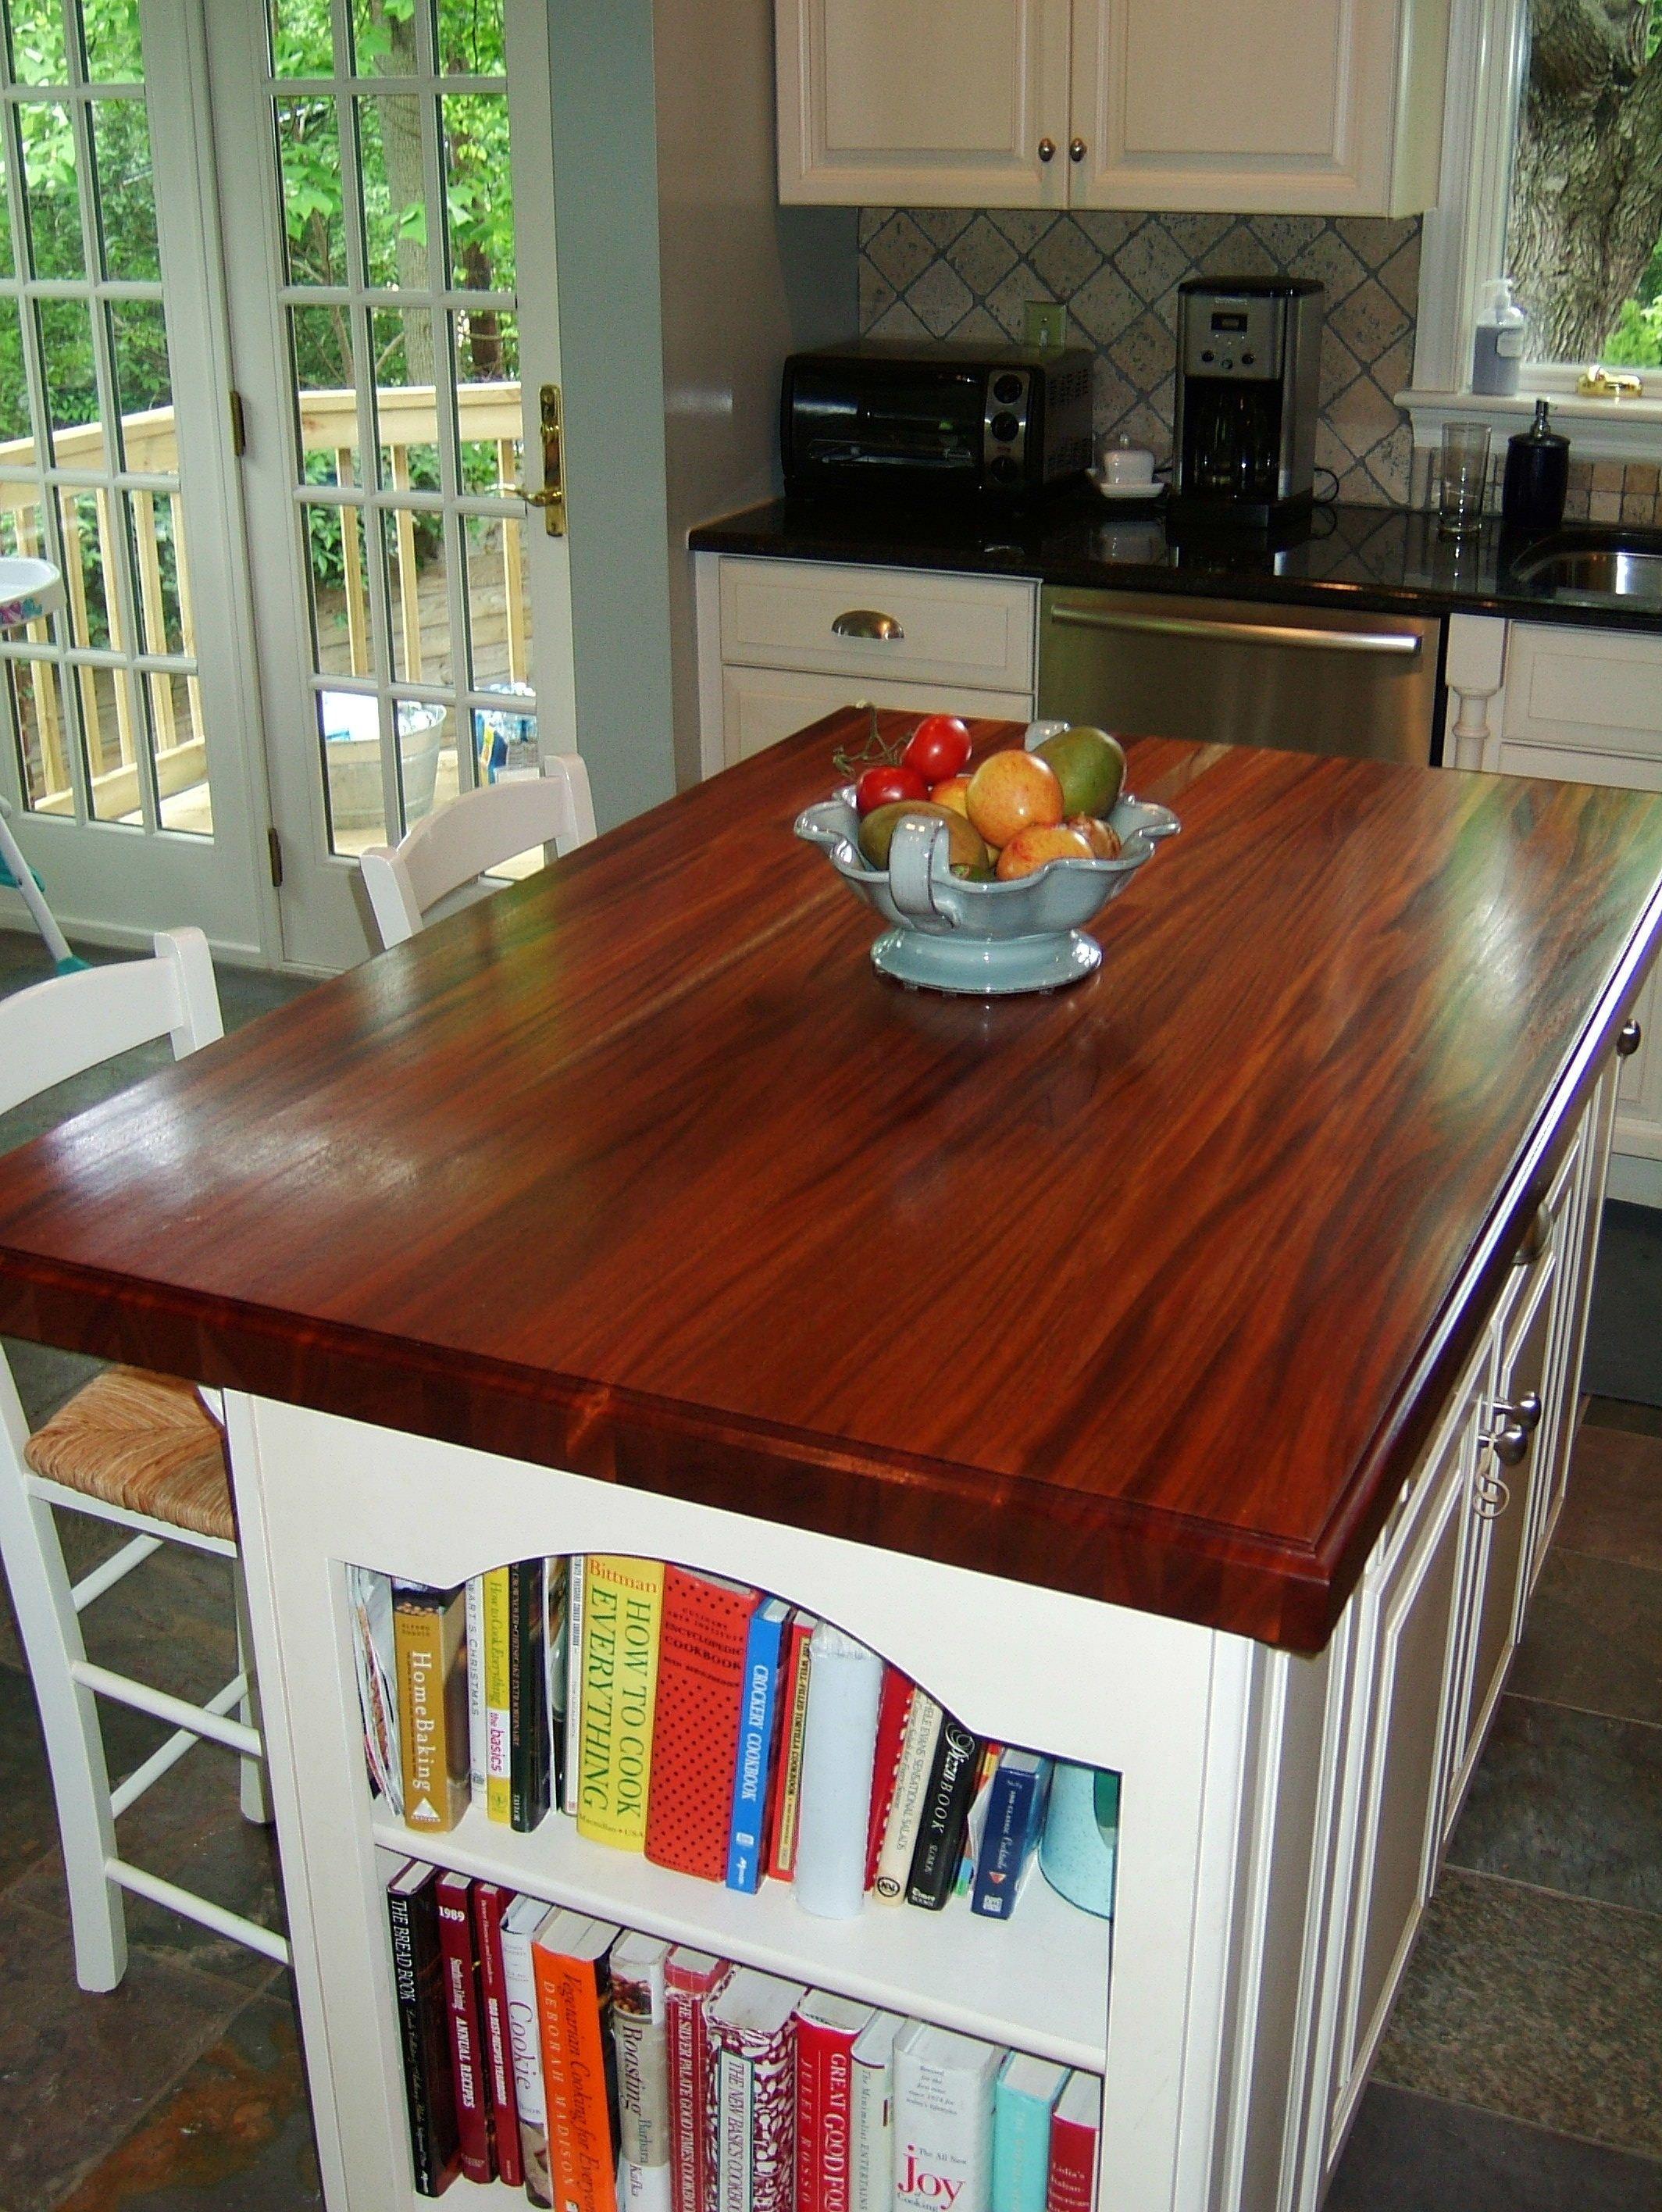 African Mahogany Wood Countertop Photo Gallery By Devos